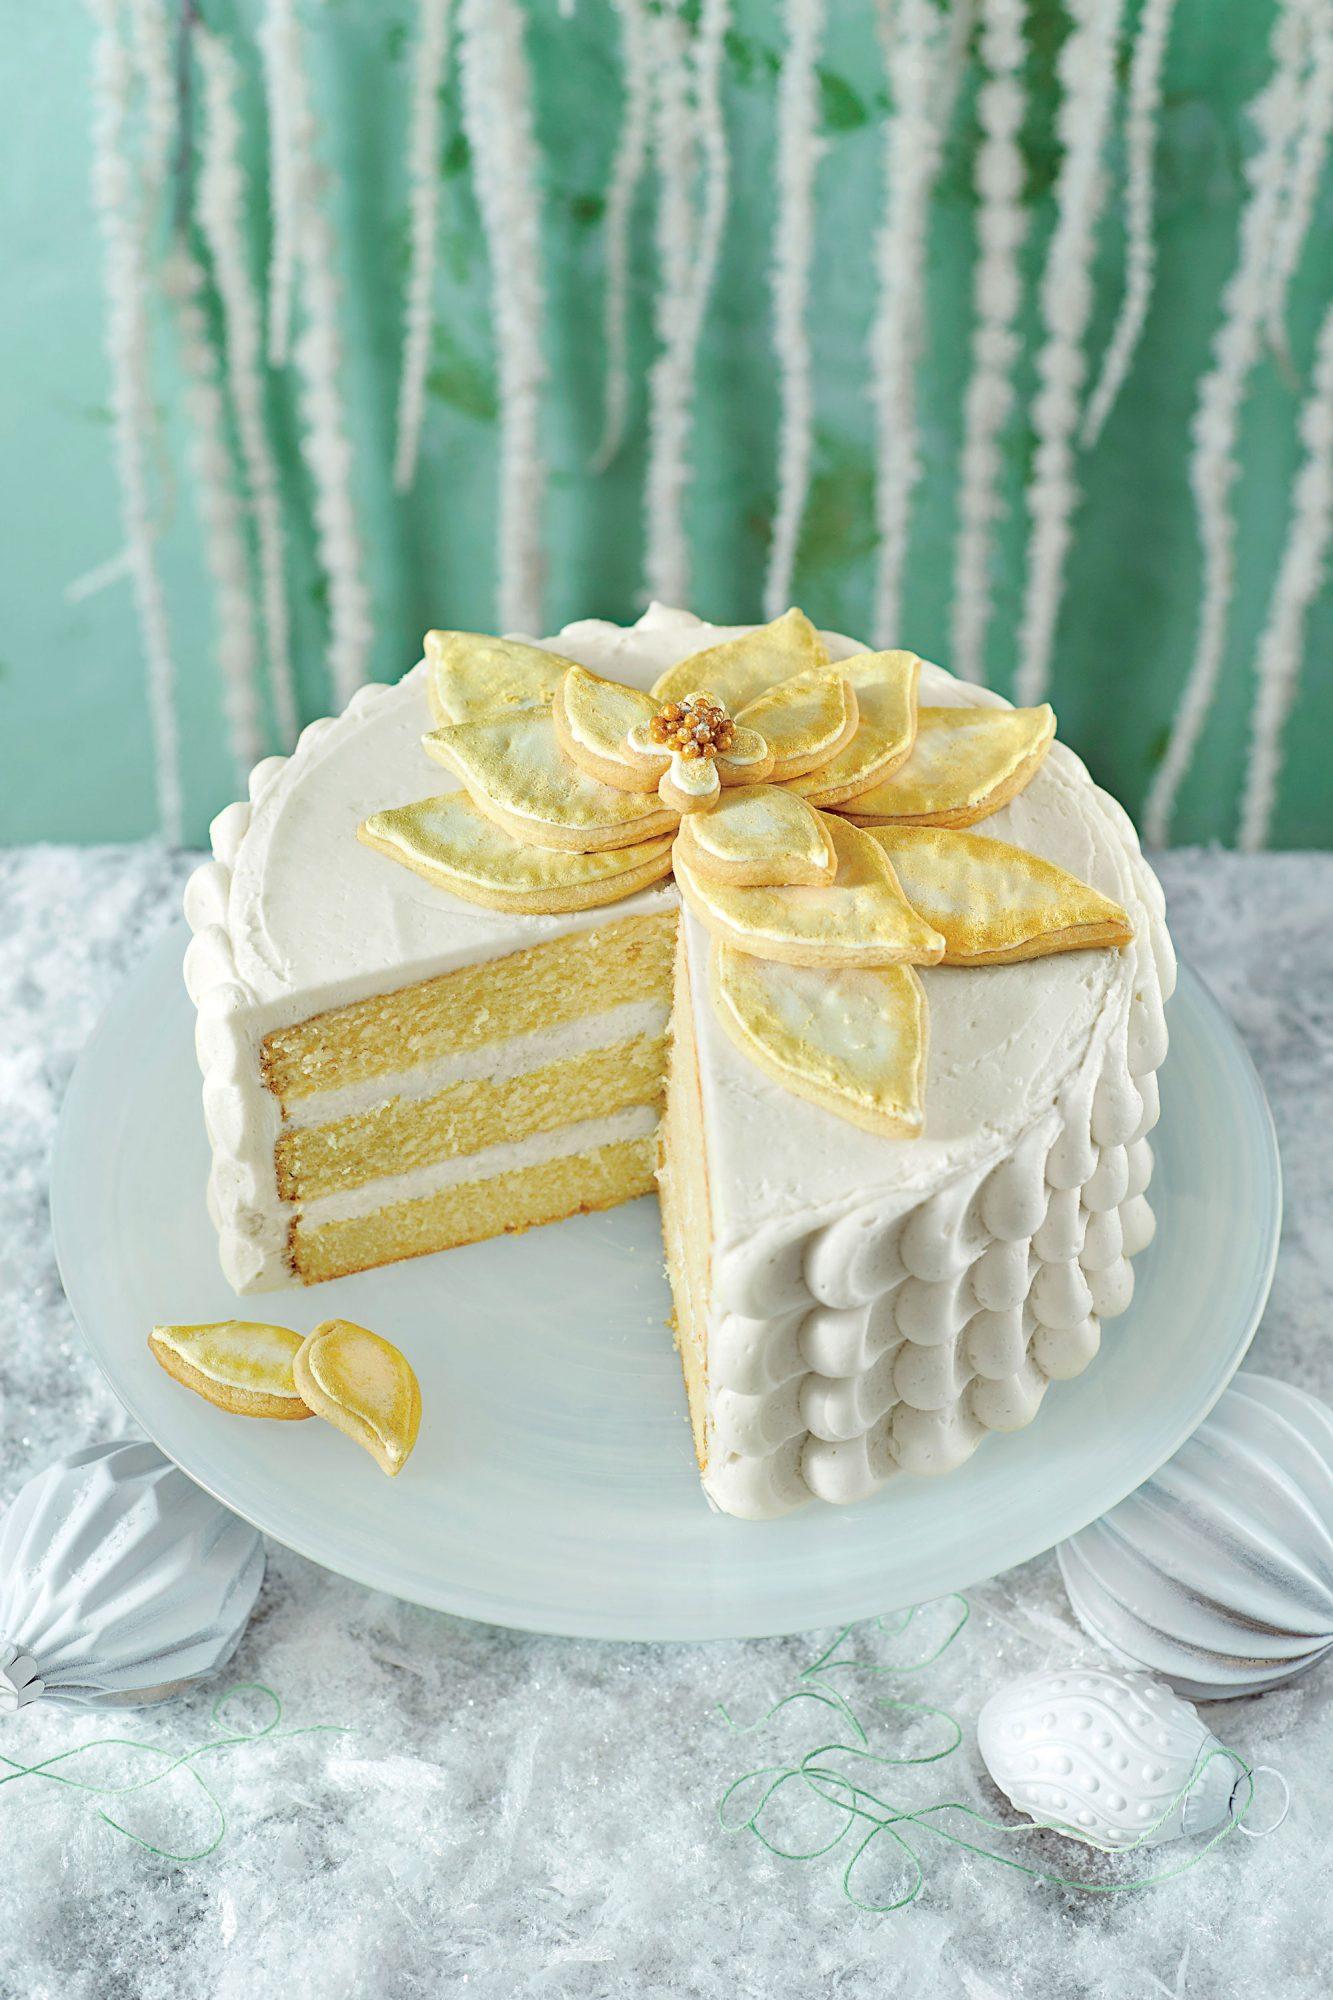 White Chocolate Poinsettia Cake Recipe Myrecipes